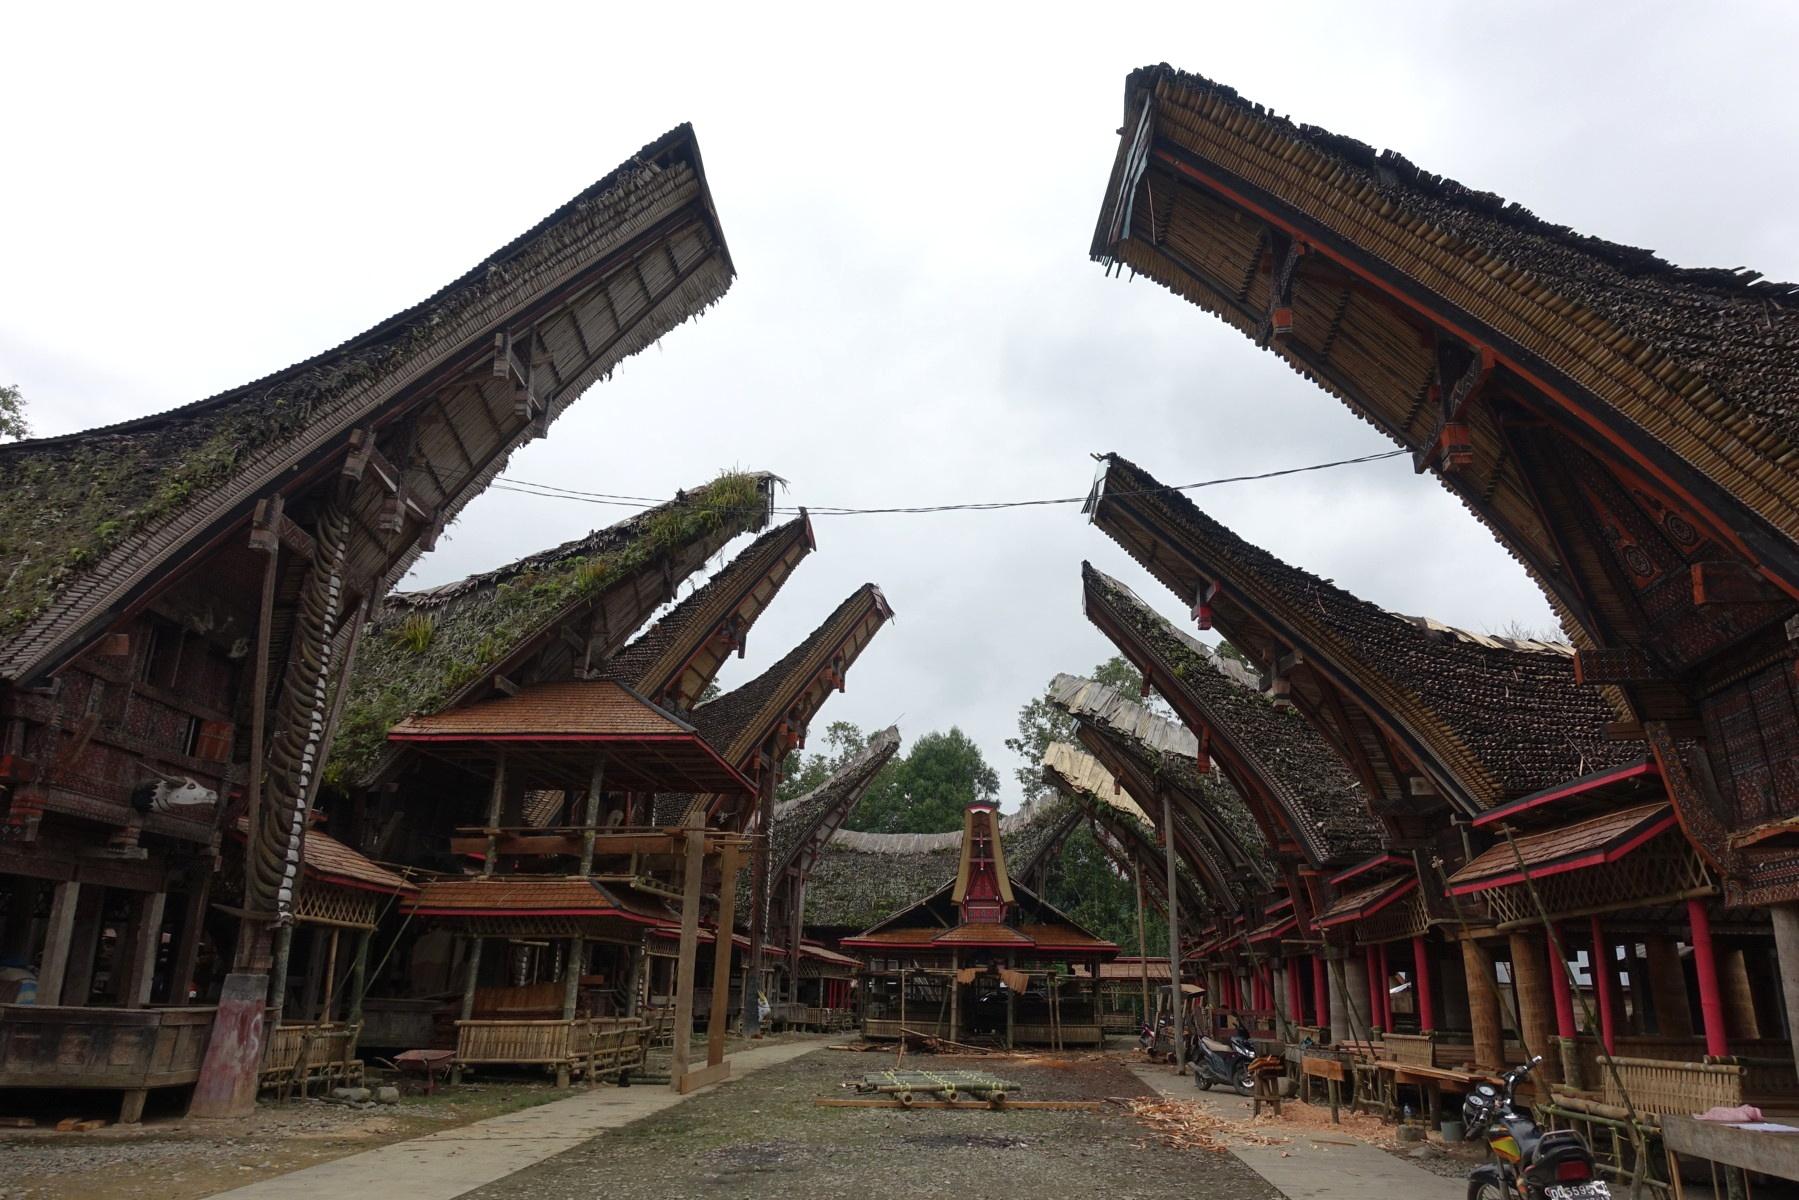 Indonesie_Sulawesi_Toraja_Rantepao DSC04773